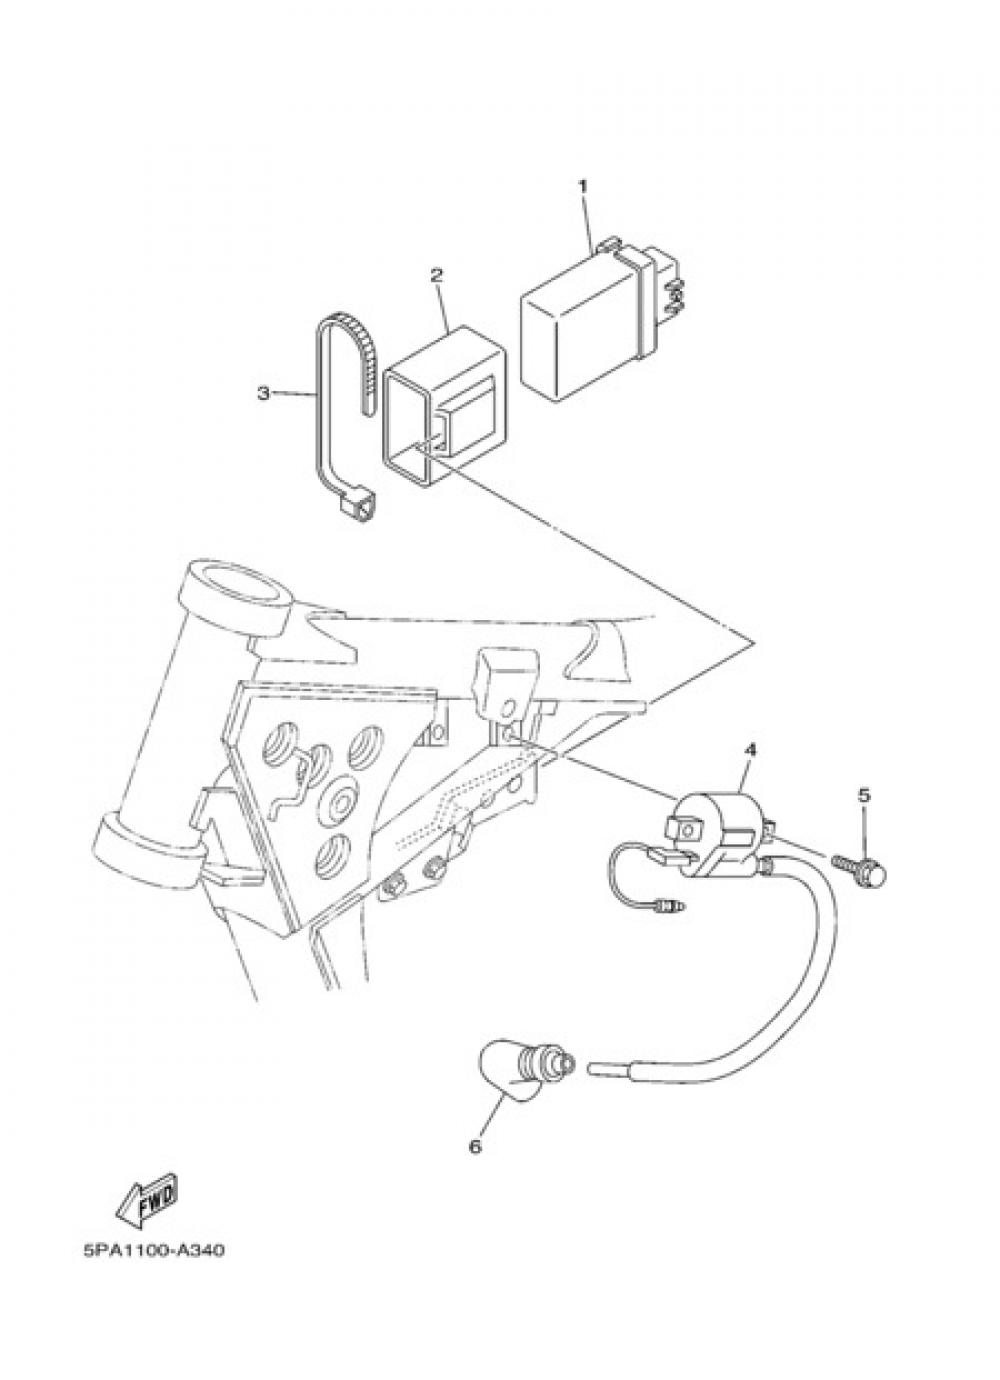 ELECTRIC EQUIPMENT 1 Yamaha YZ85 2004